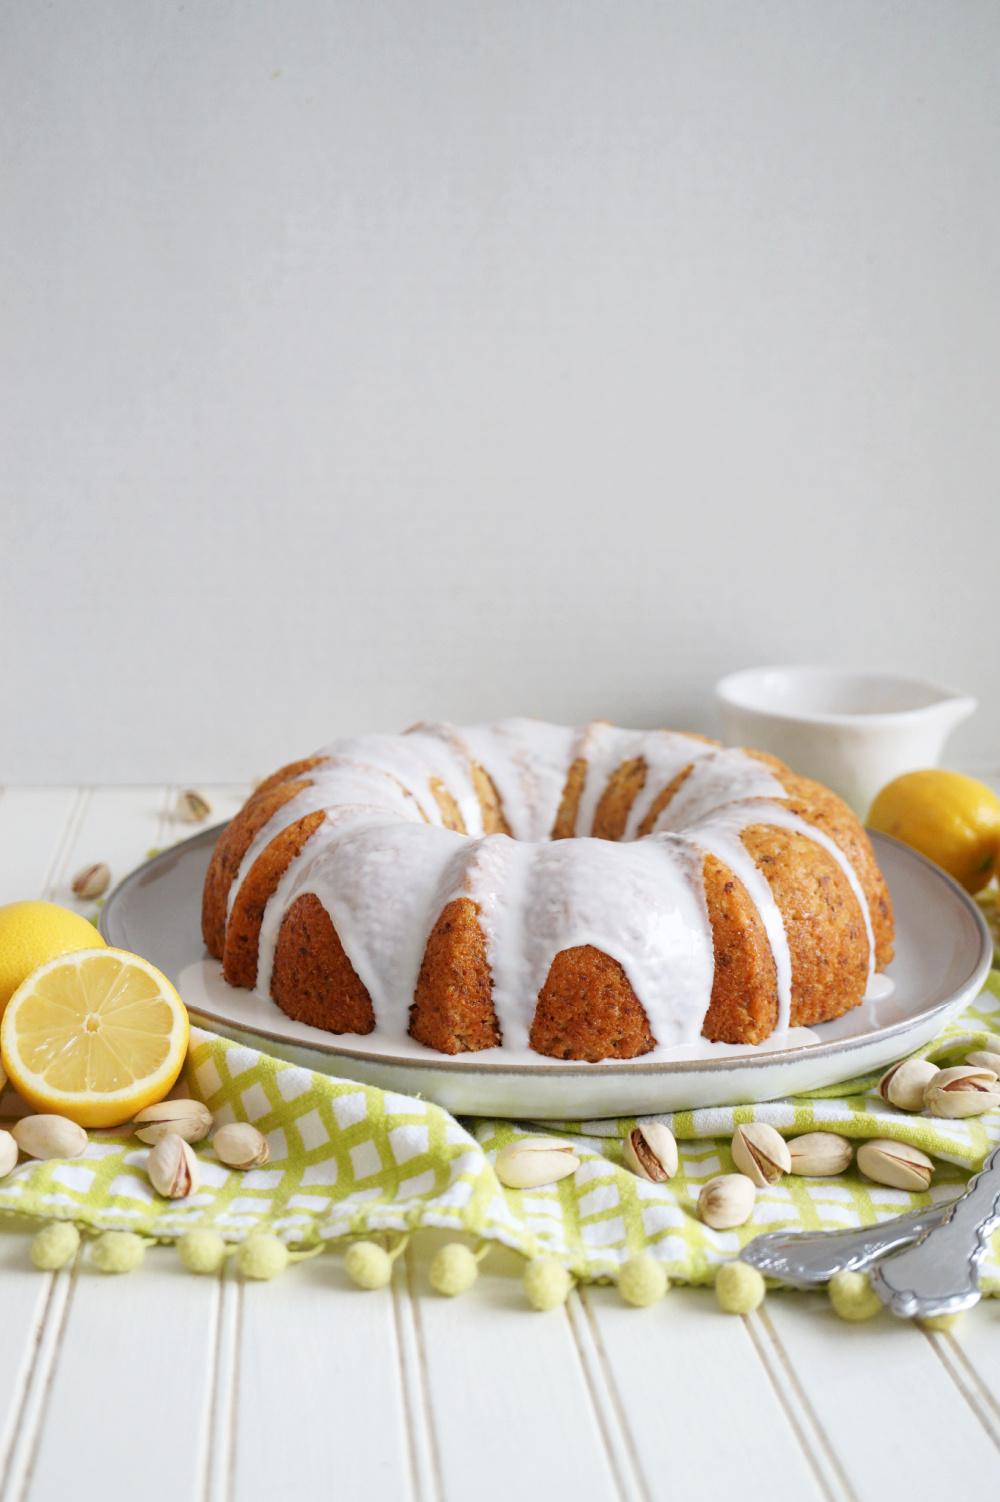 frosted lemon pistachio bundt cake on plate